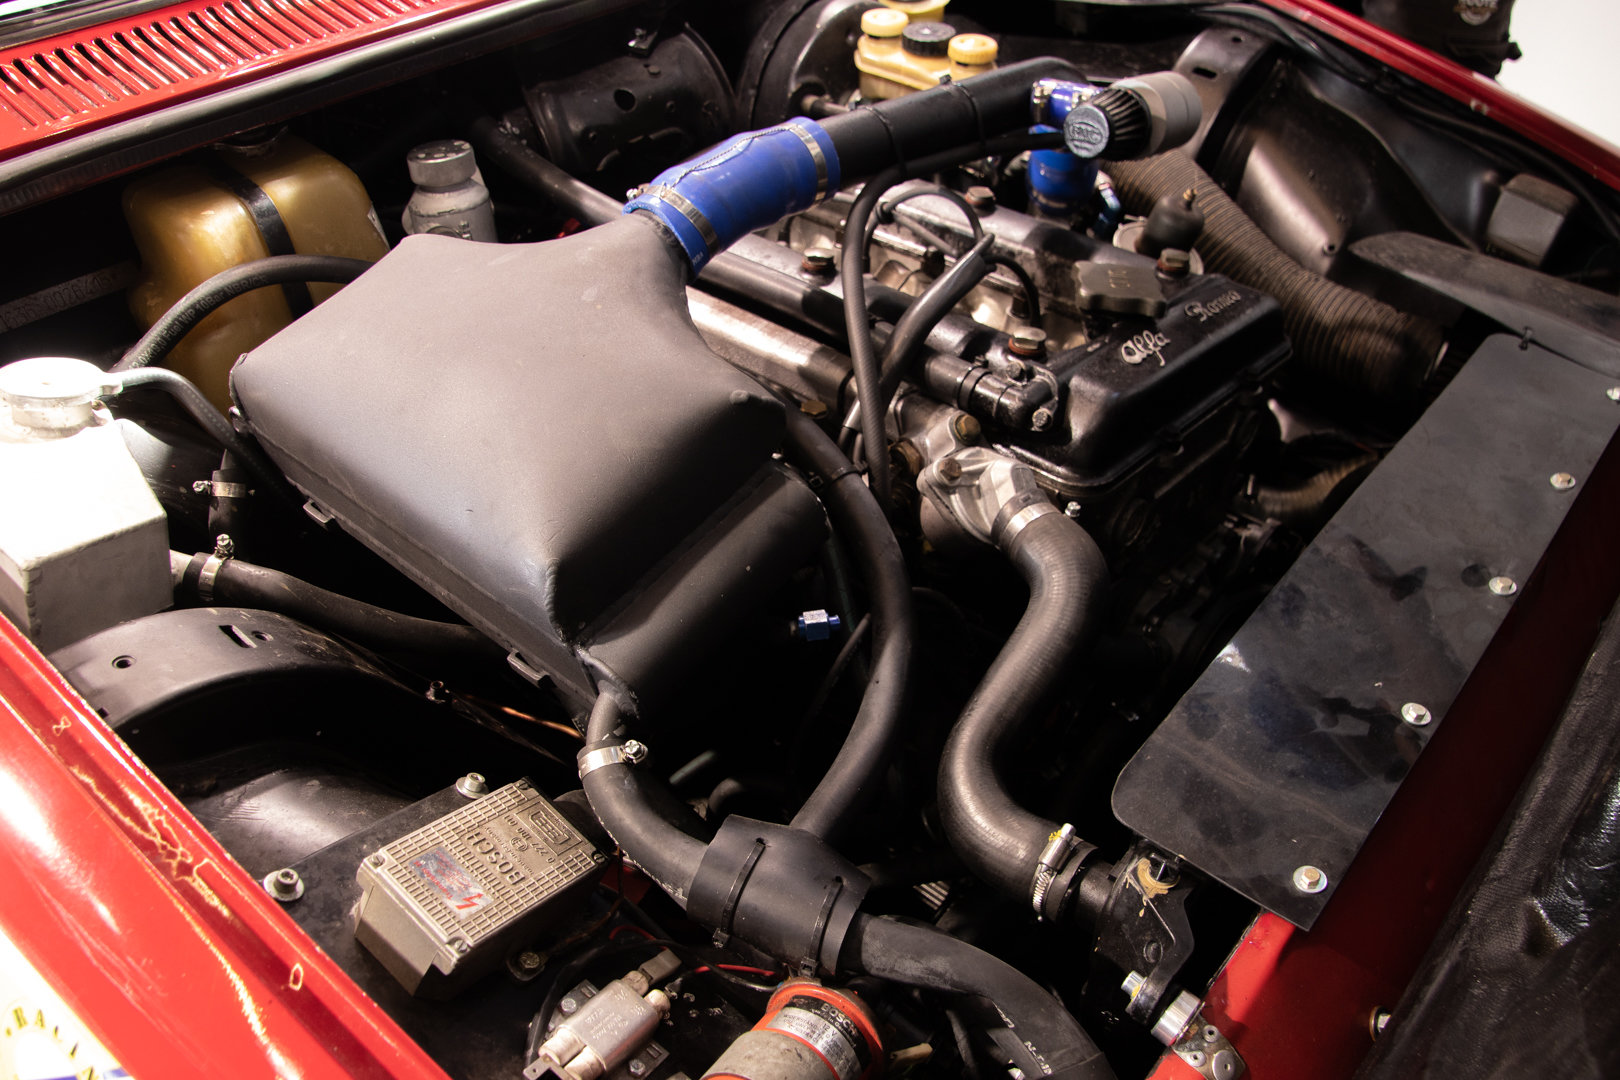 Alfa Romeo Alfetta GTV TURBODELTA Gruppo 4 - 1979  For Sale (picture 4 of 6)